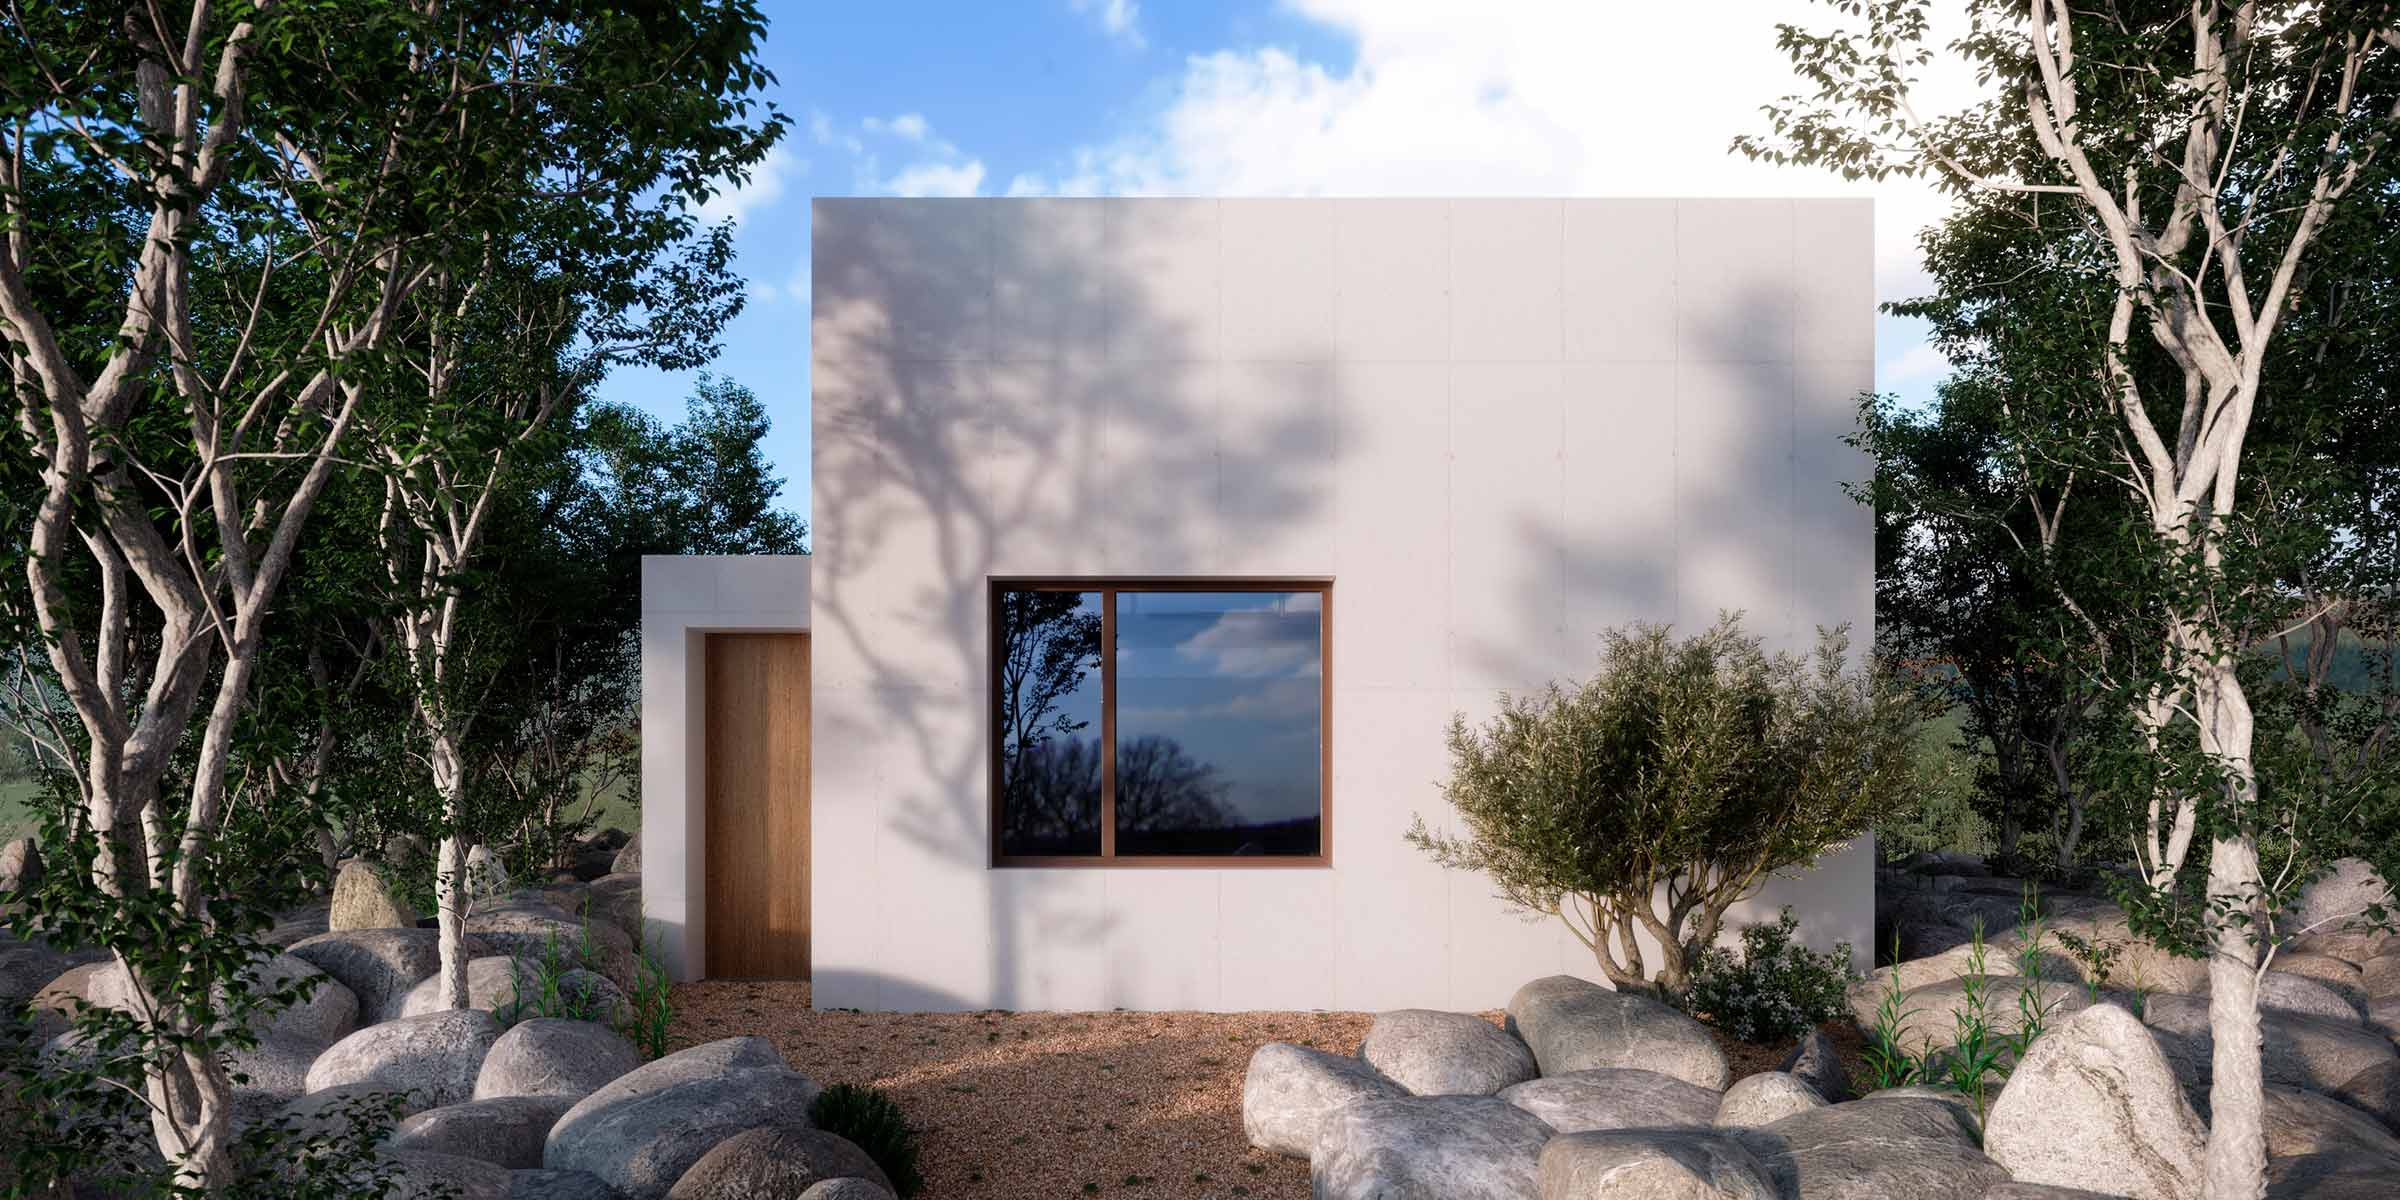 ventana practicable thermia LUMIA